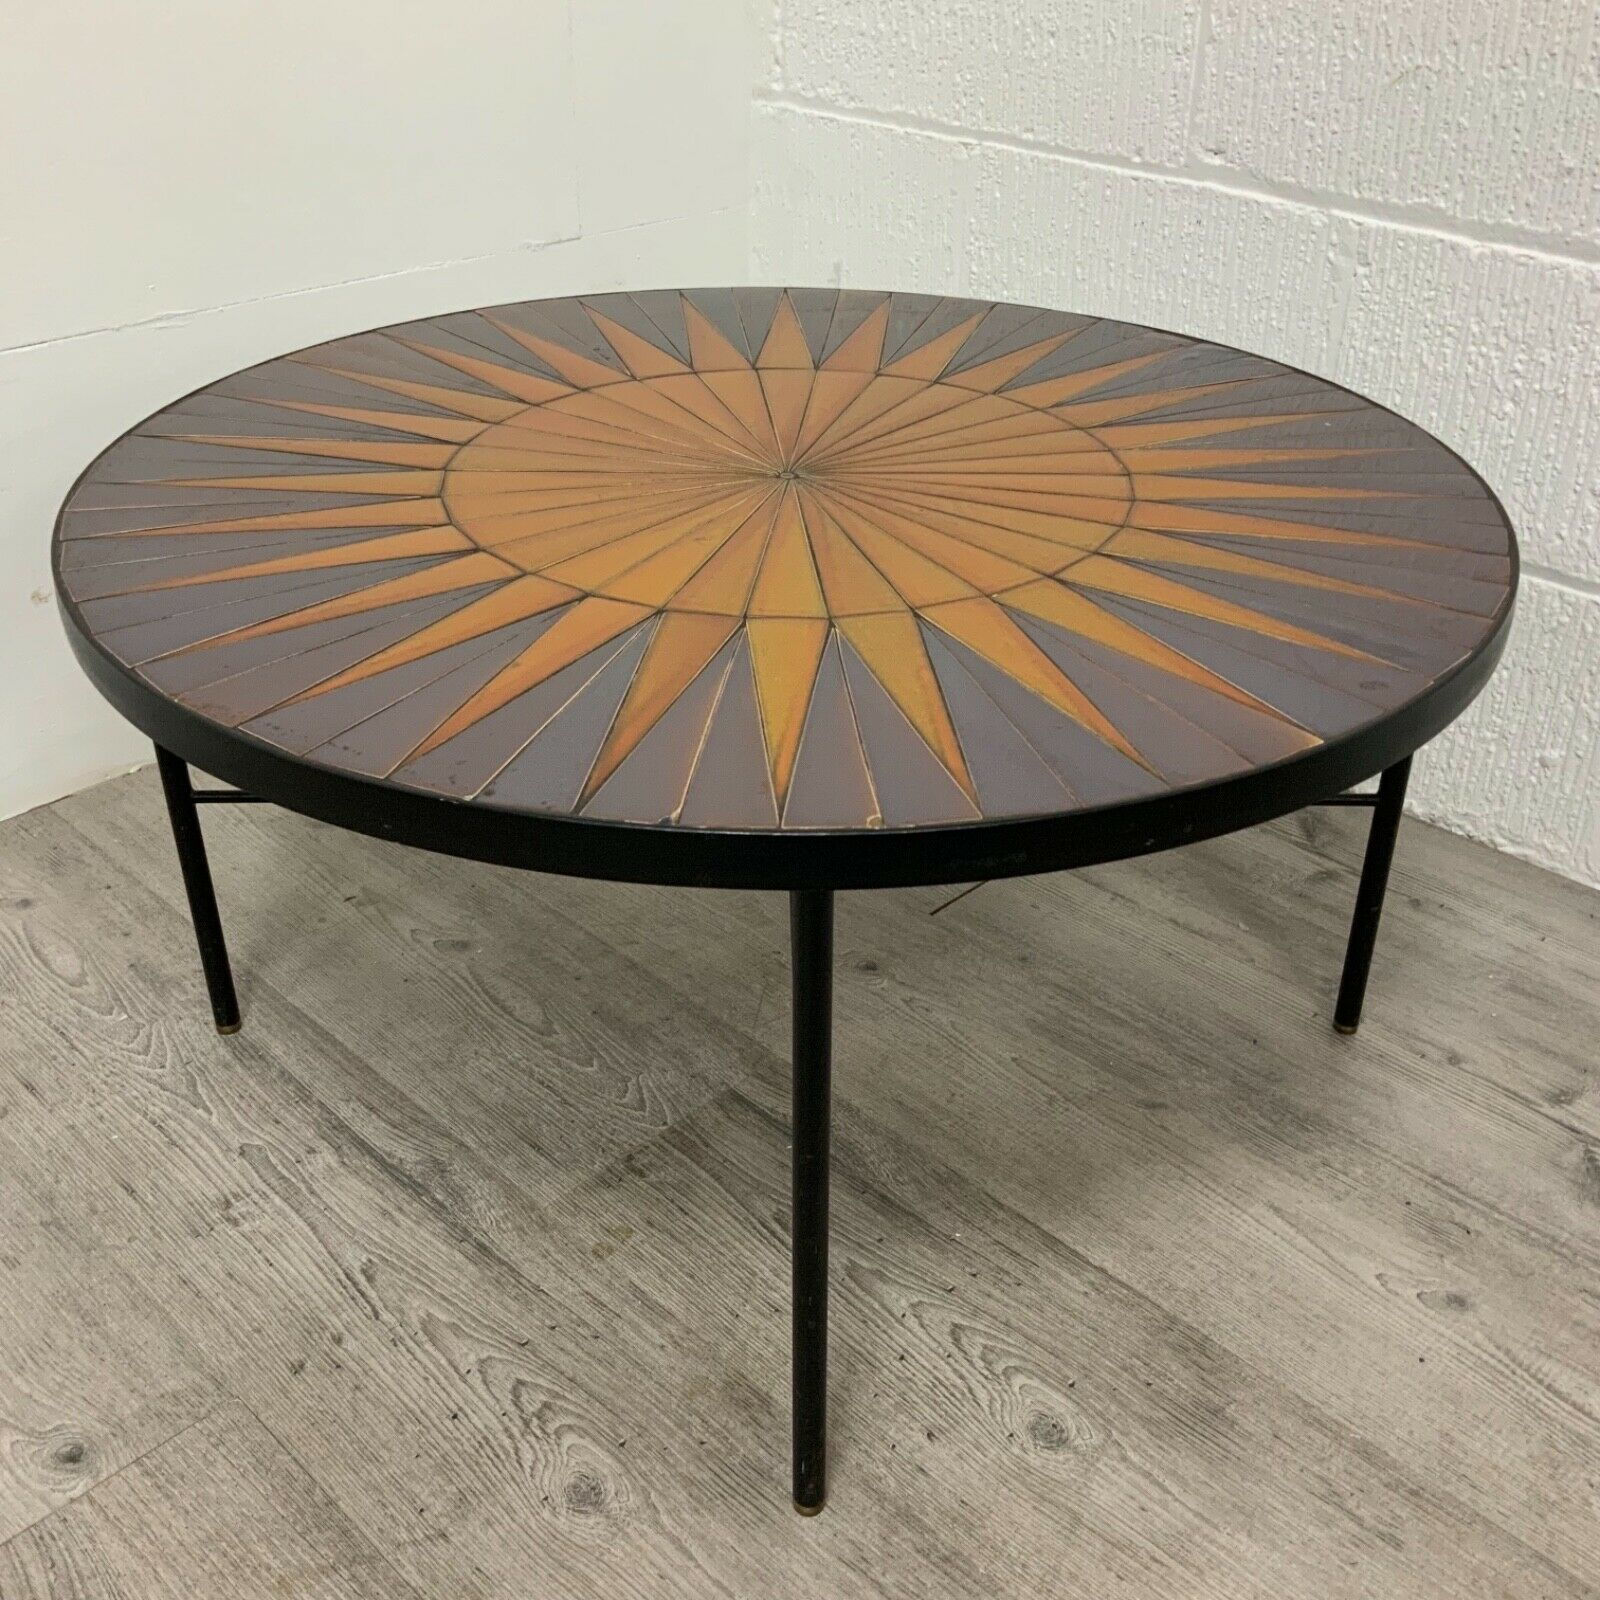 Vintage Mid Century Round Starburst Tile Topped Coffee Table